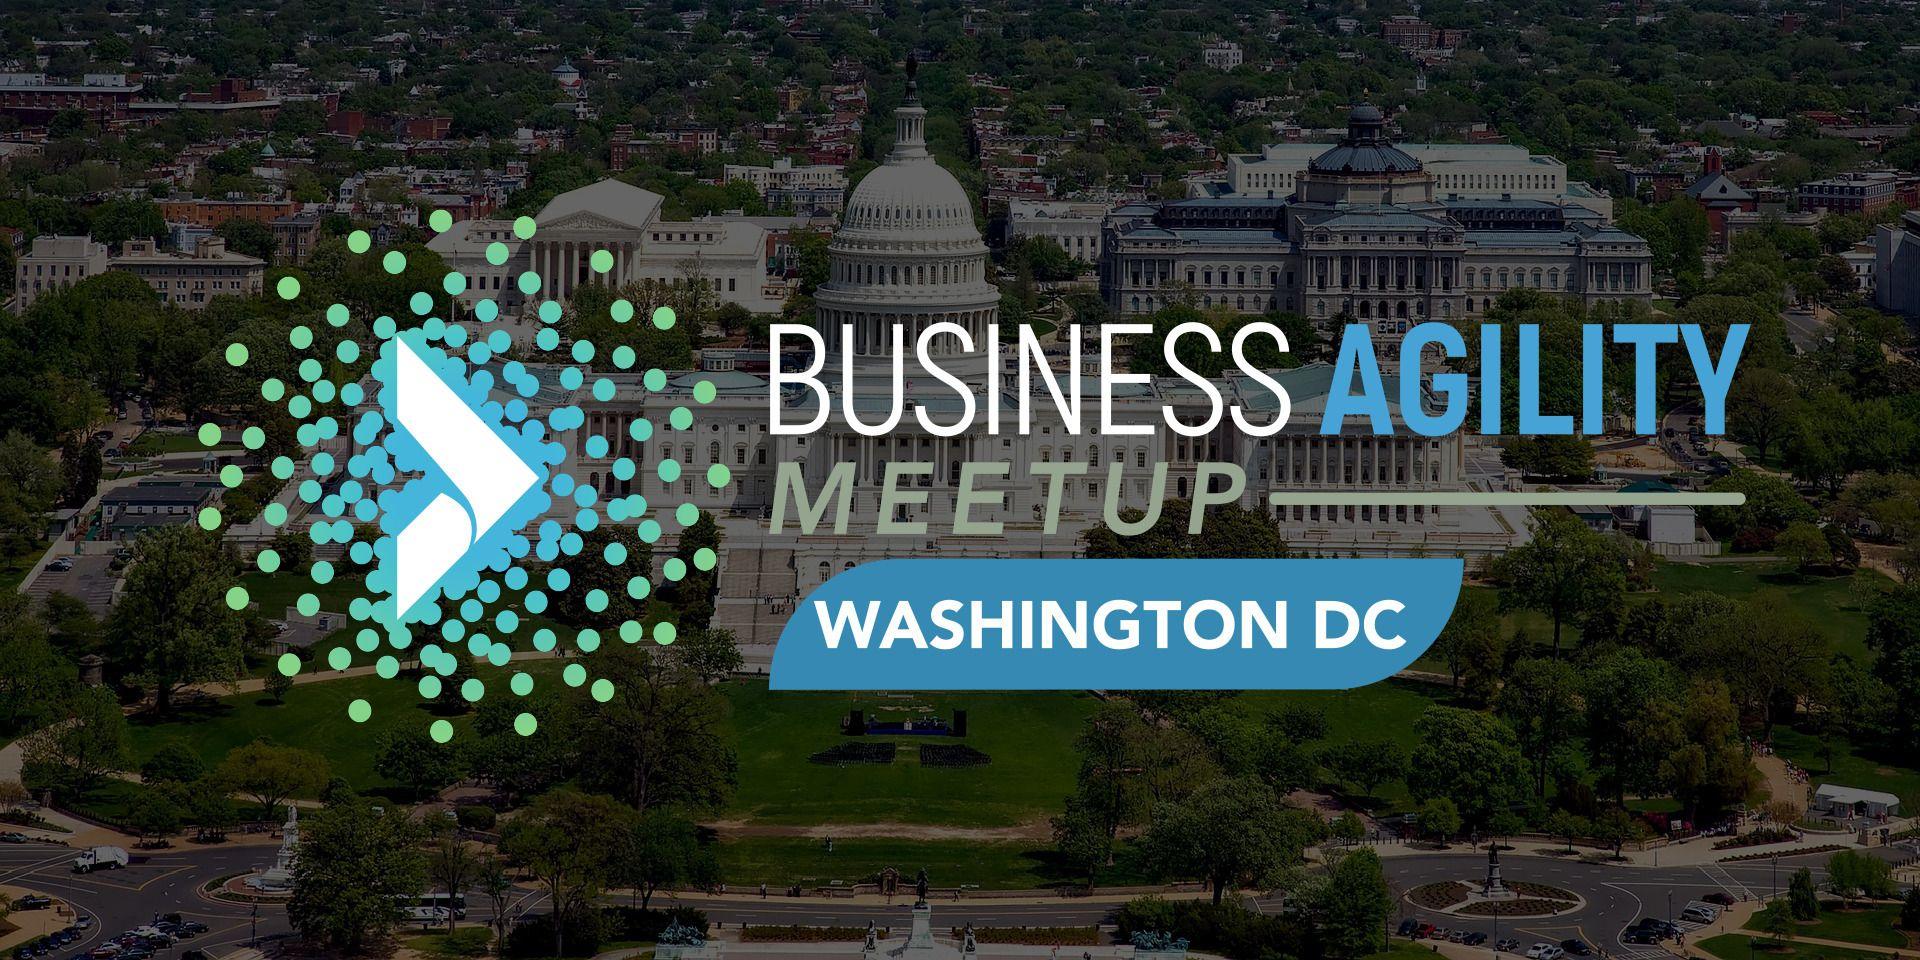 Business Agility - Washington DC